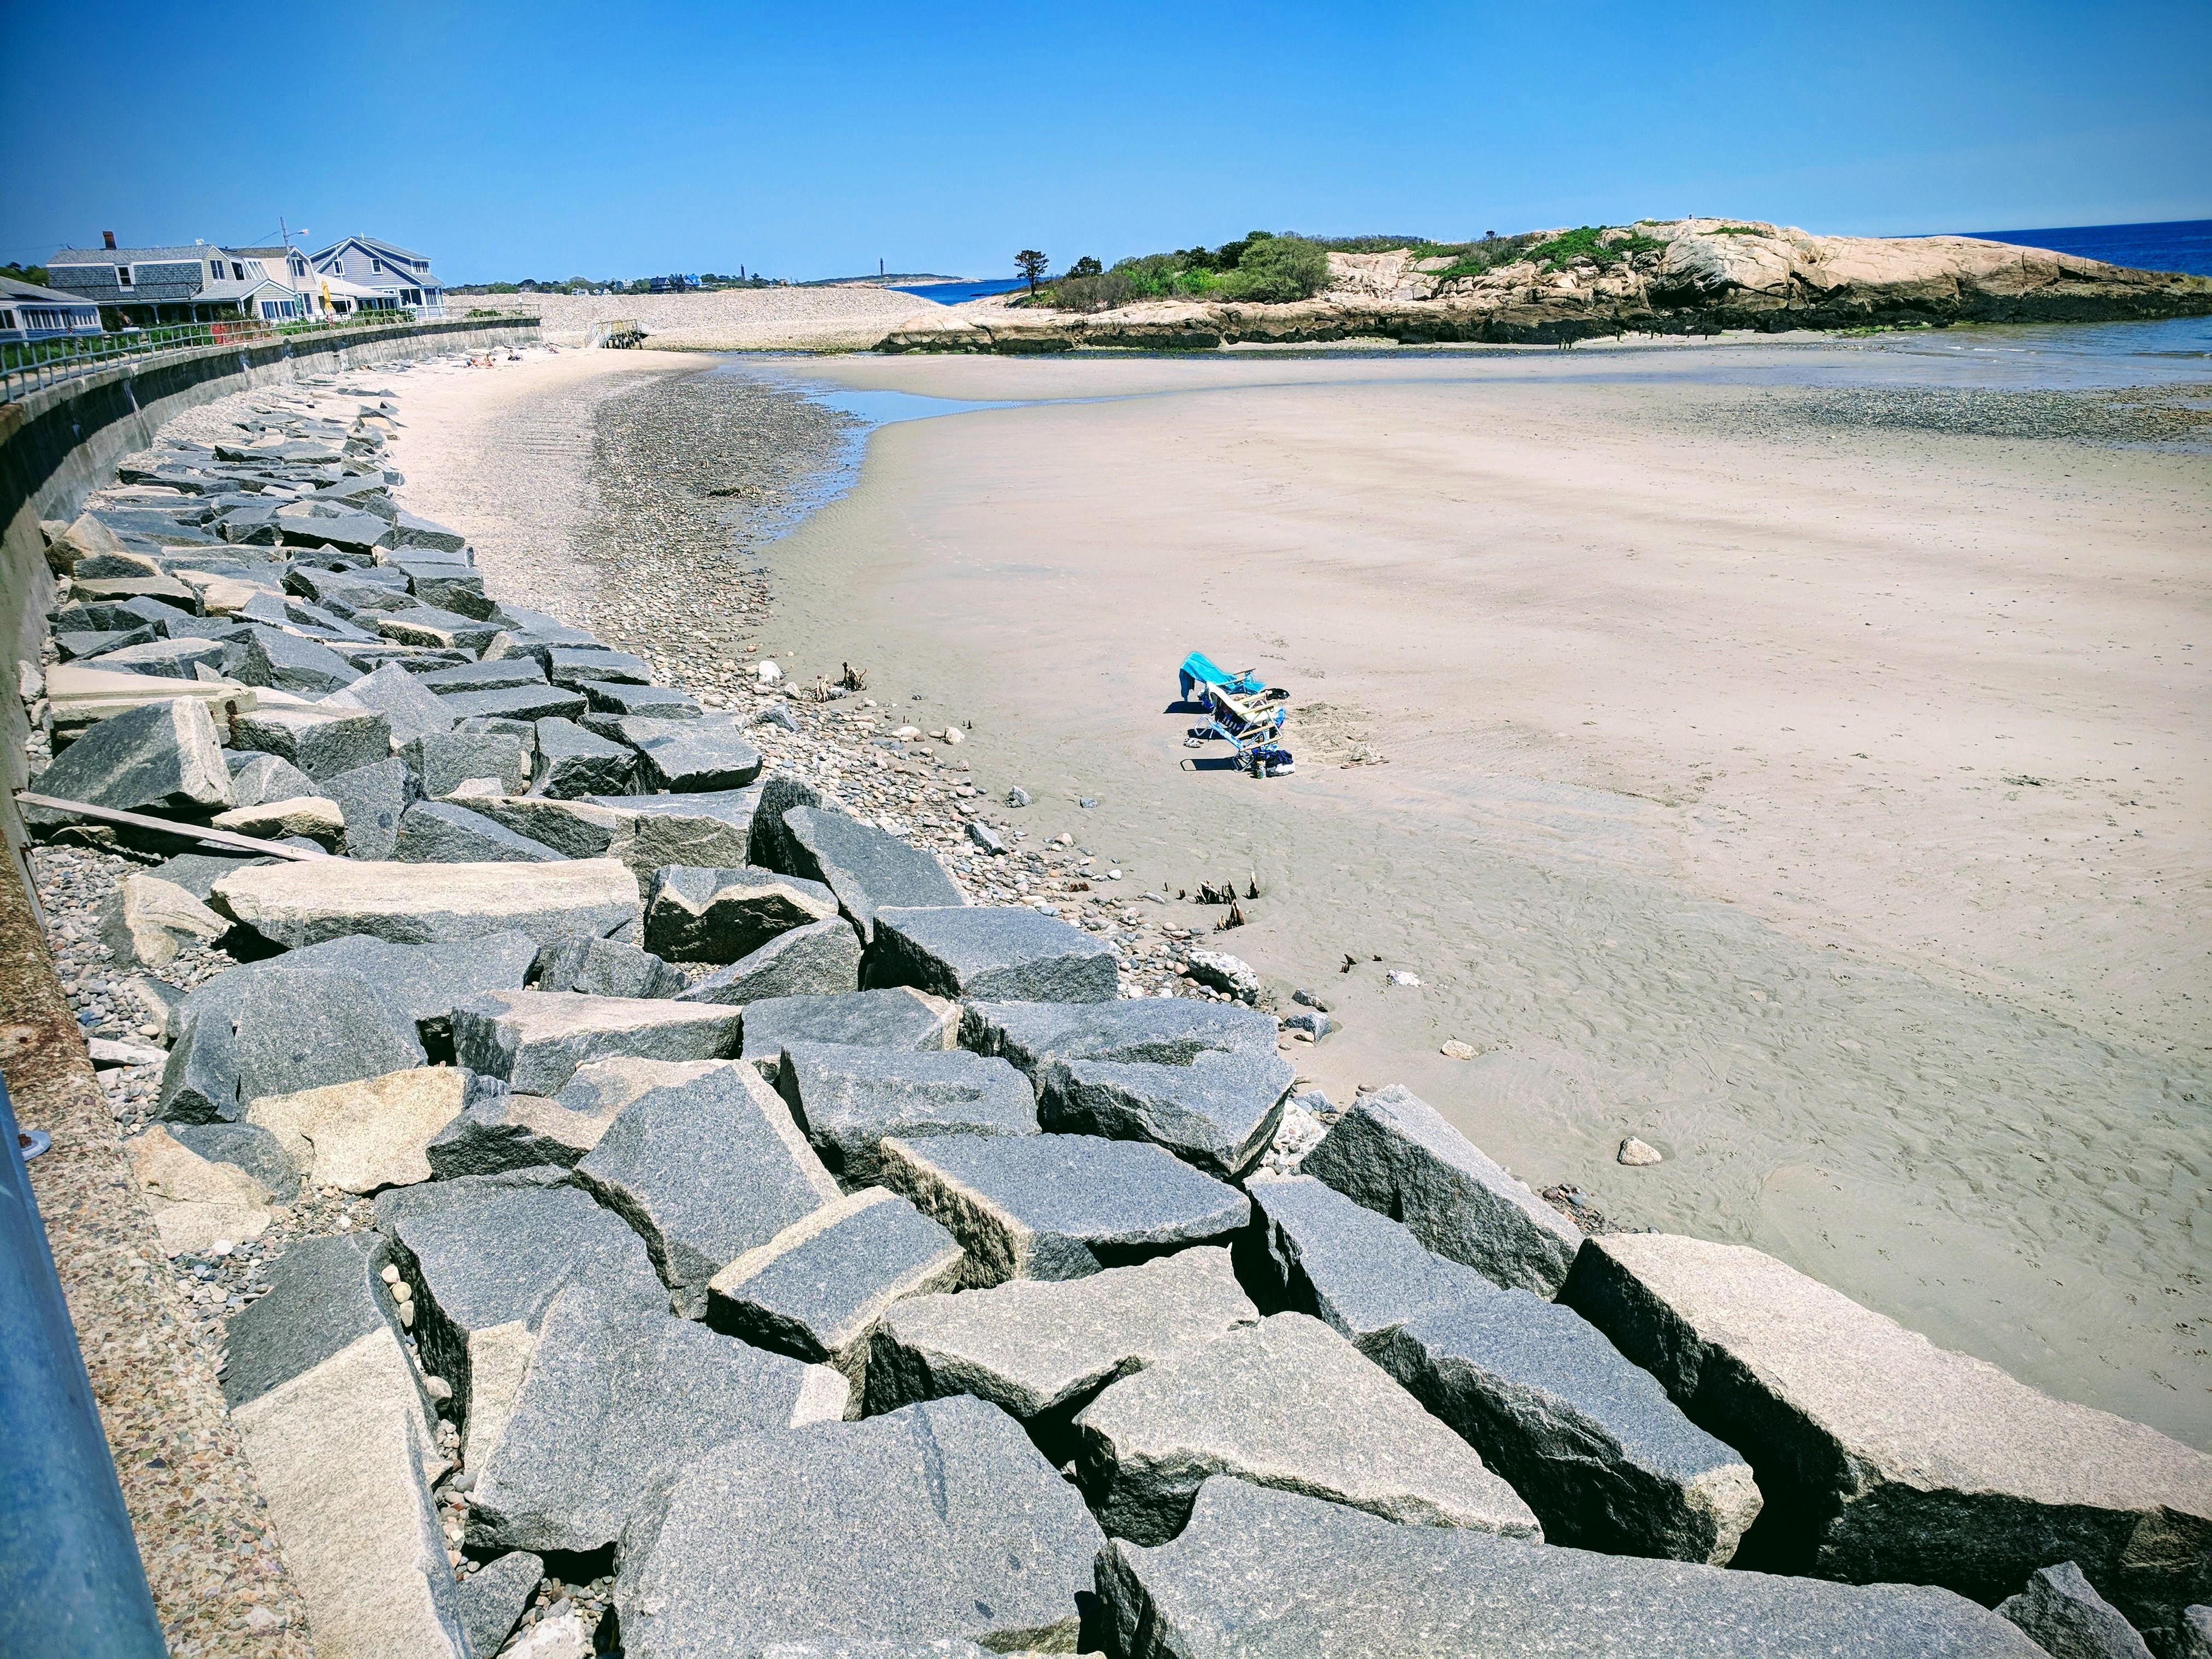 Long Beach Massachustts after winter 2018 storm damage- mangrove like roots surface©c ryan_20180523_134700